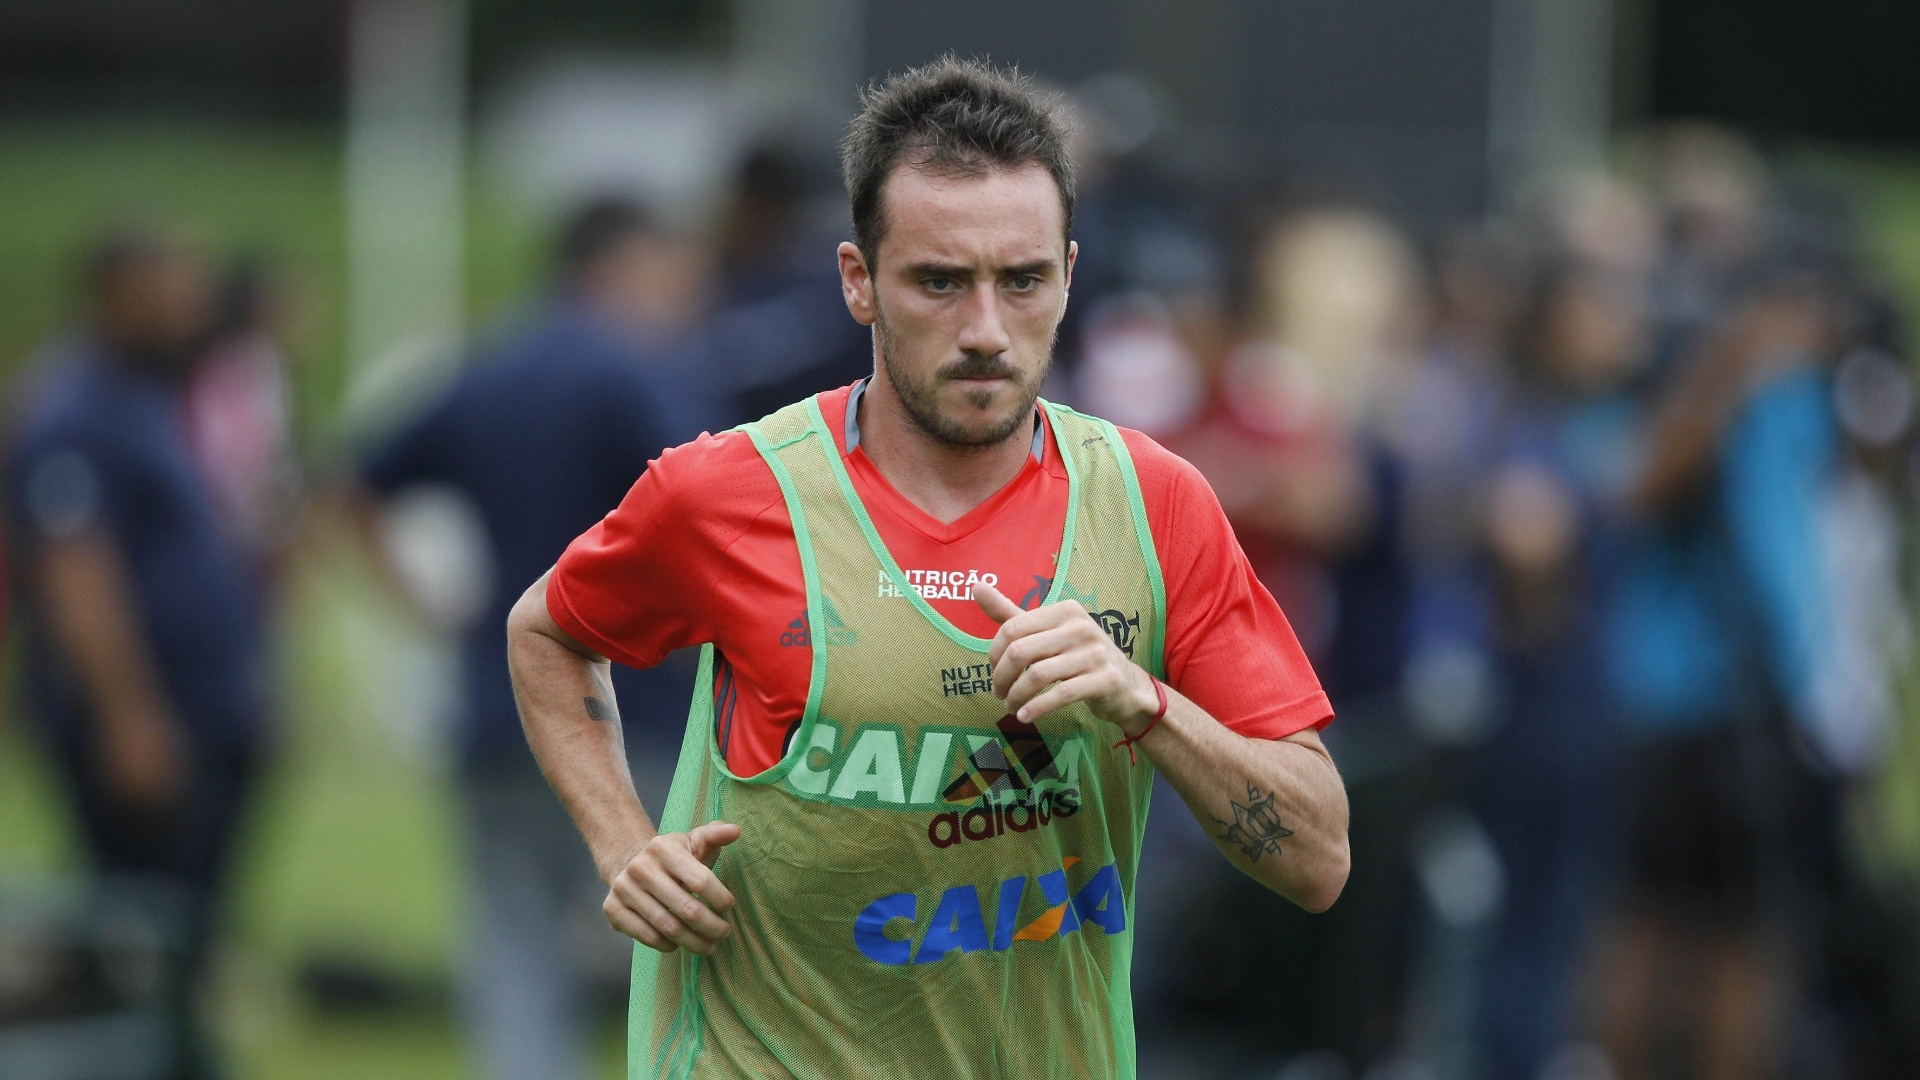 O meia argentino Frederico Mancuello corre durante treinamento do Flamengo